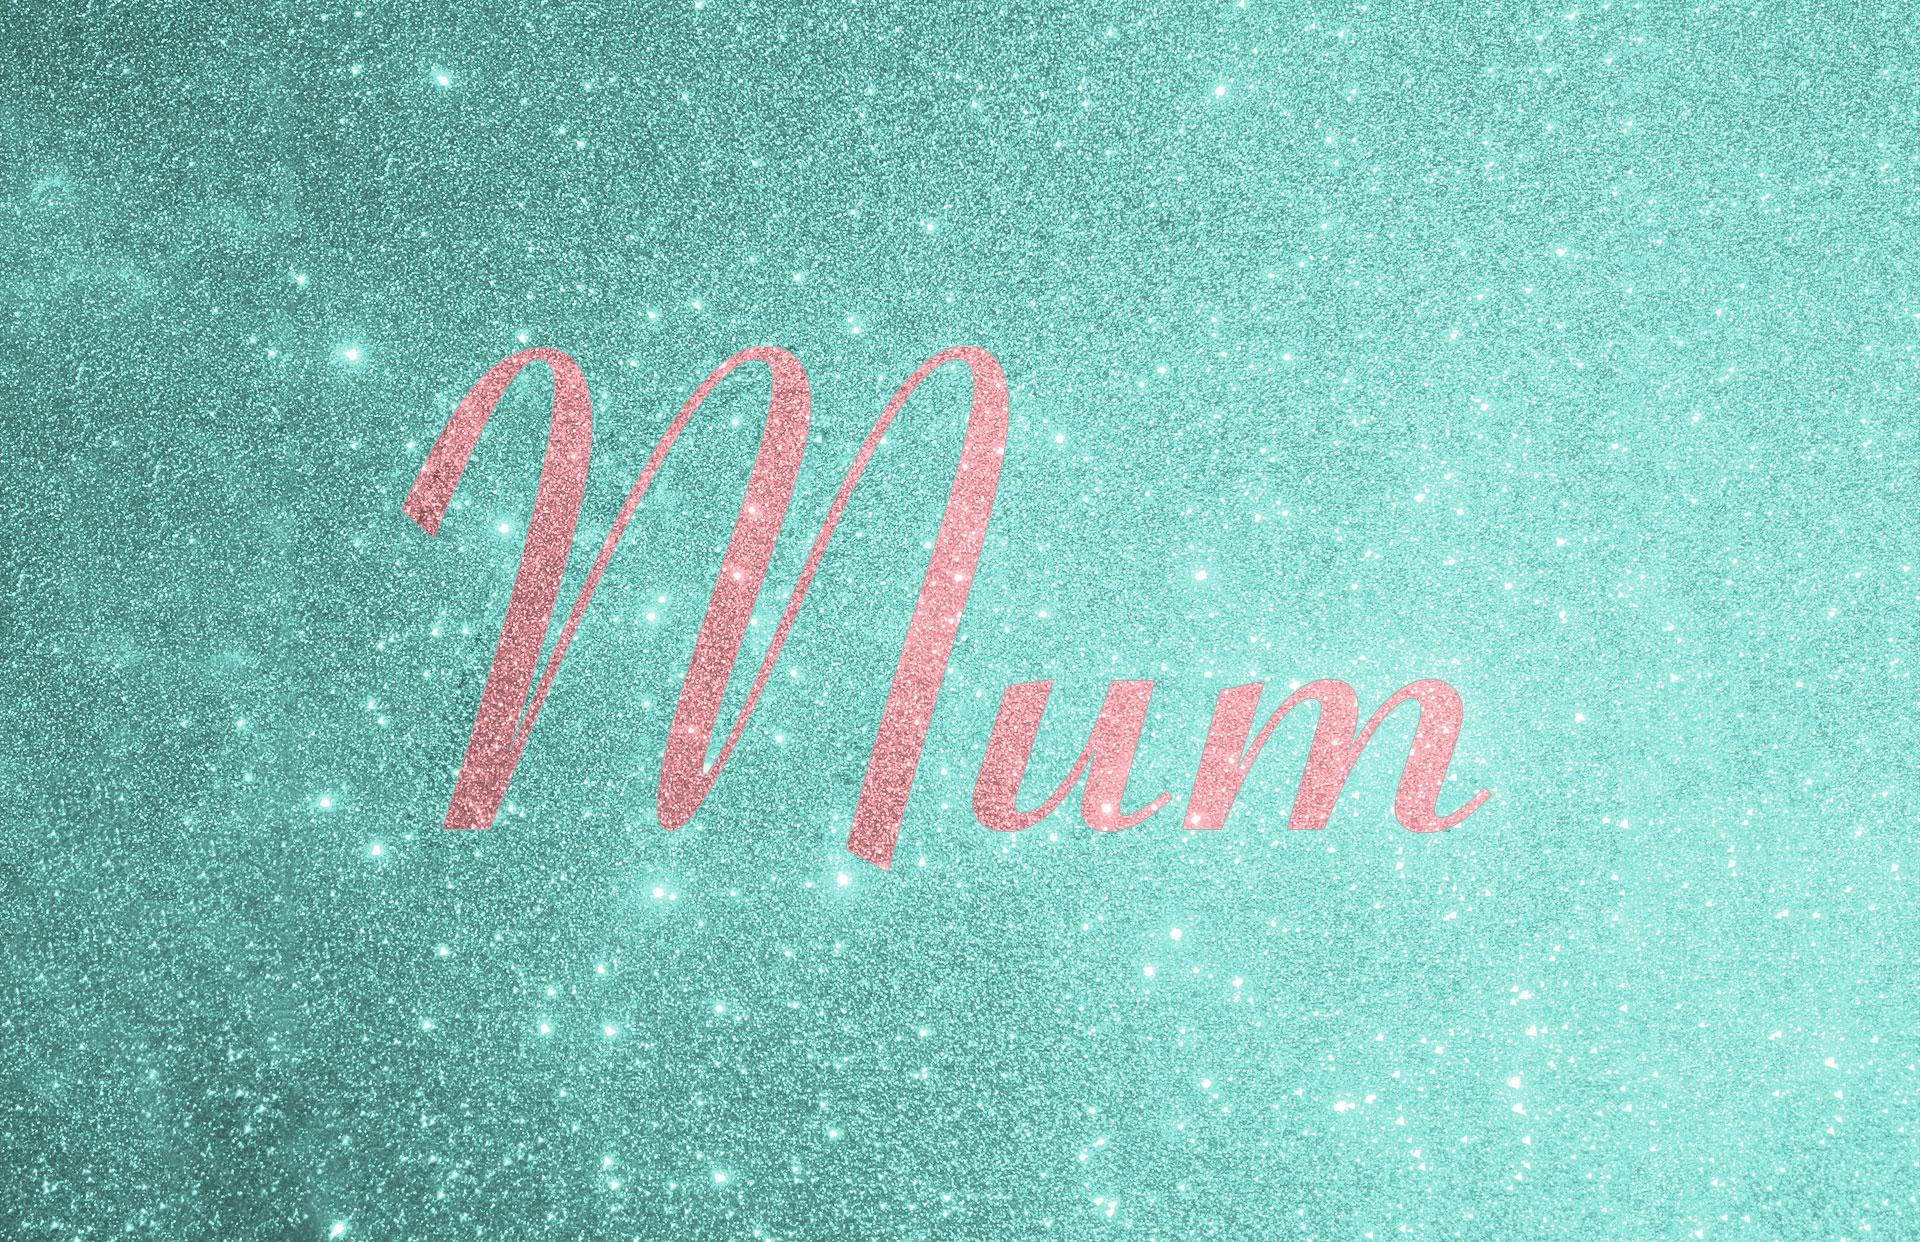 Glitter contrast wording shown in disco pink